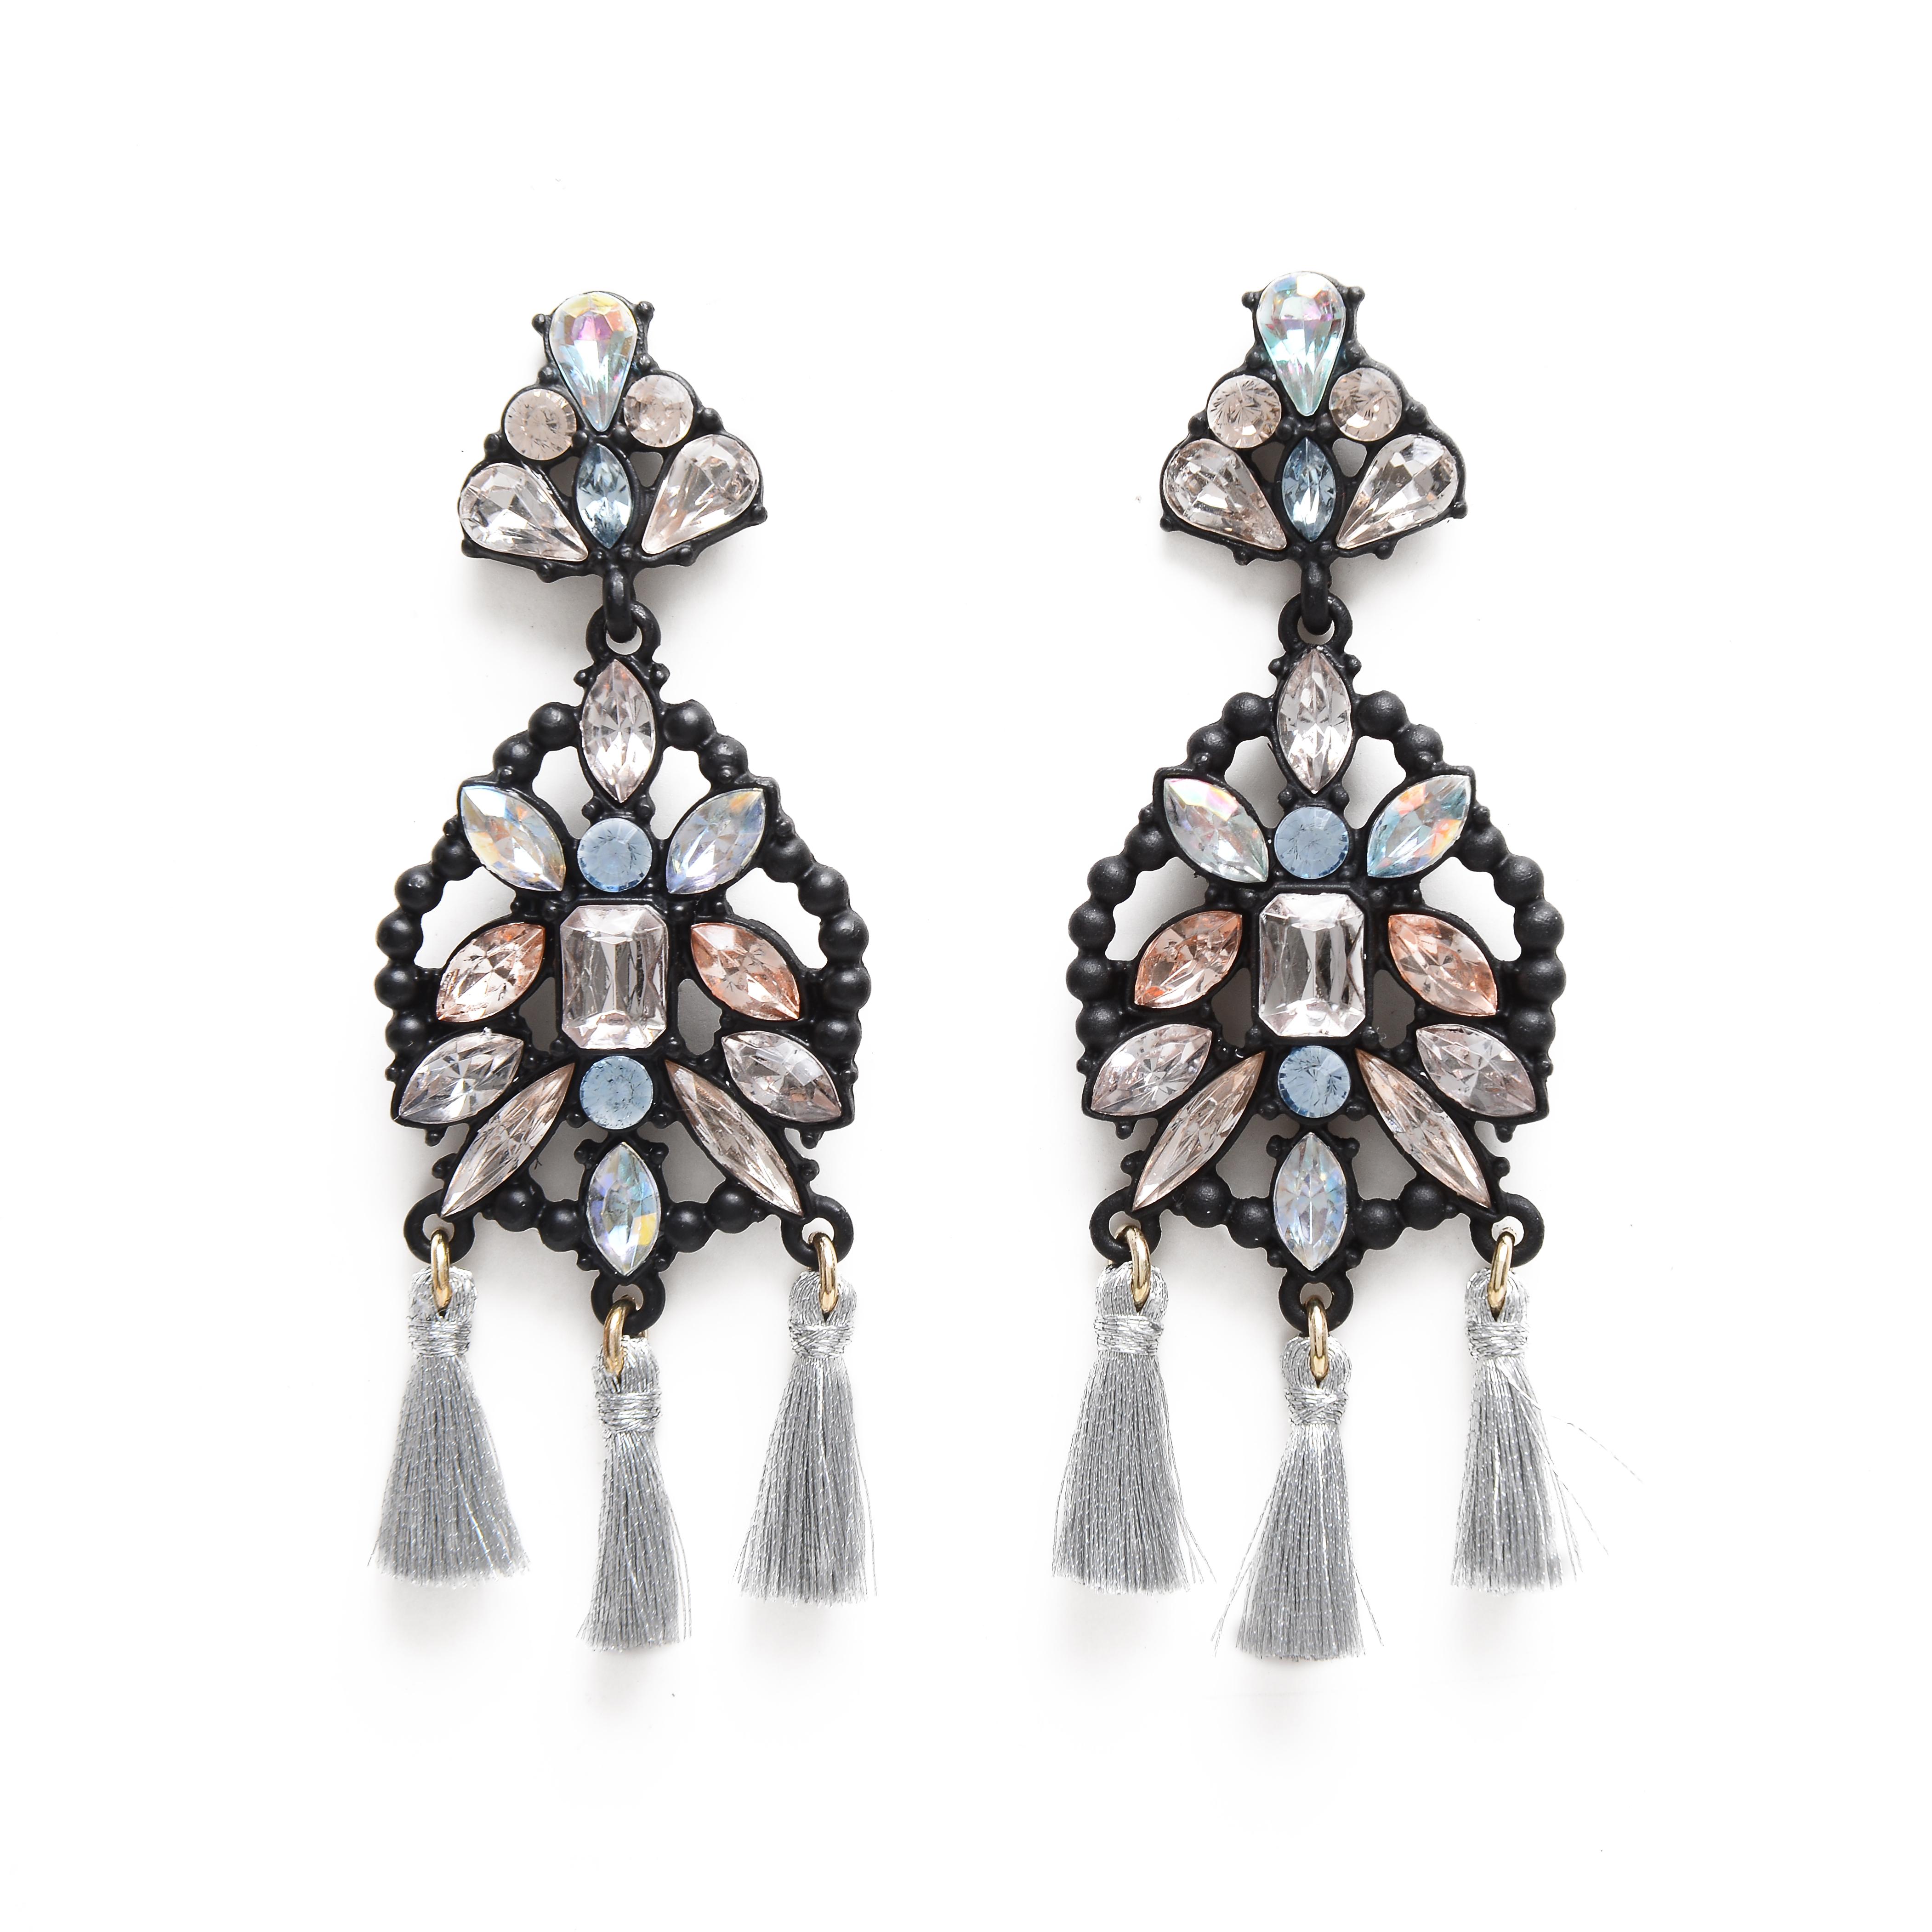 SUGARFIX by BaubleBar Statement Earrings, $14.99